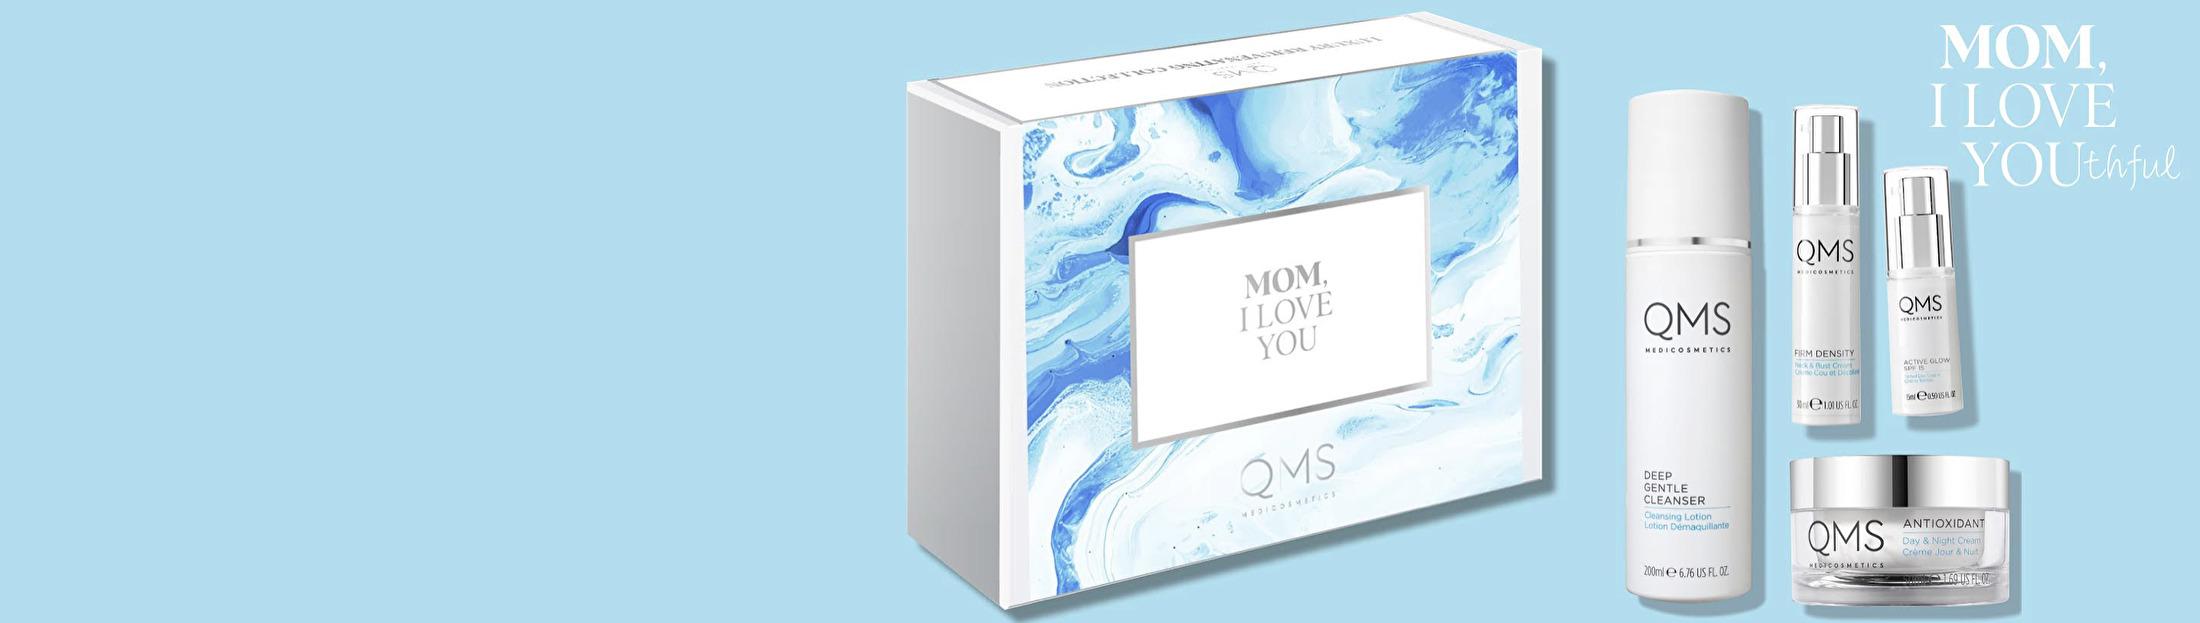 QMS Moederdag Cadeau Set